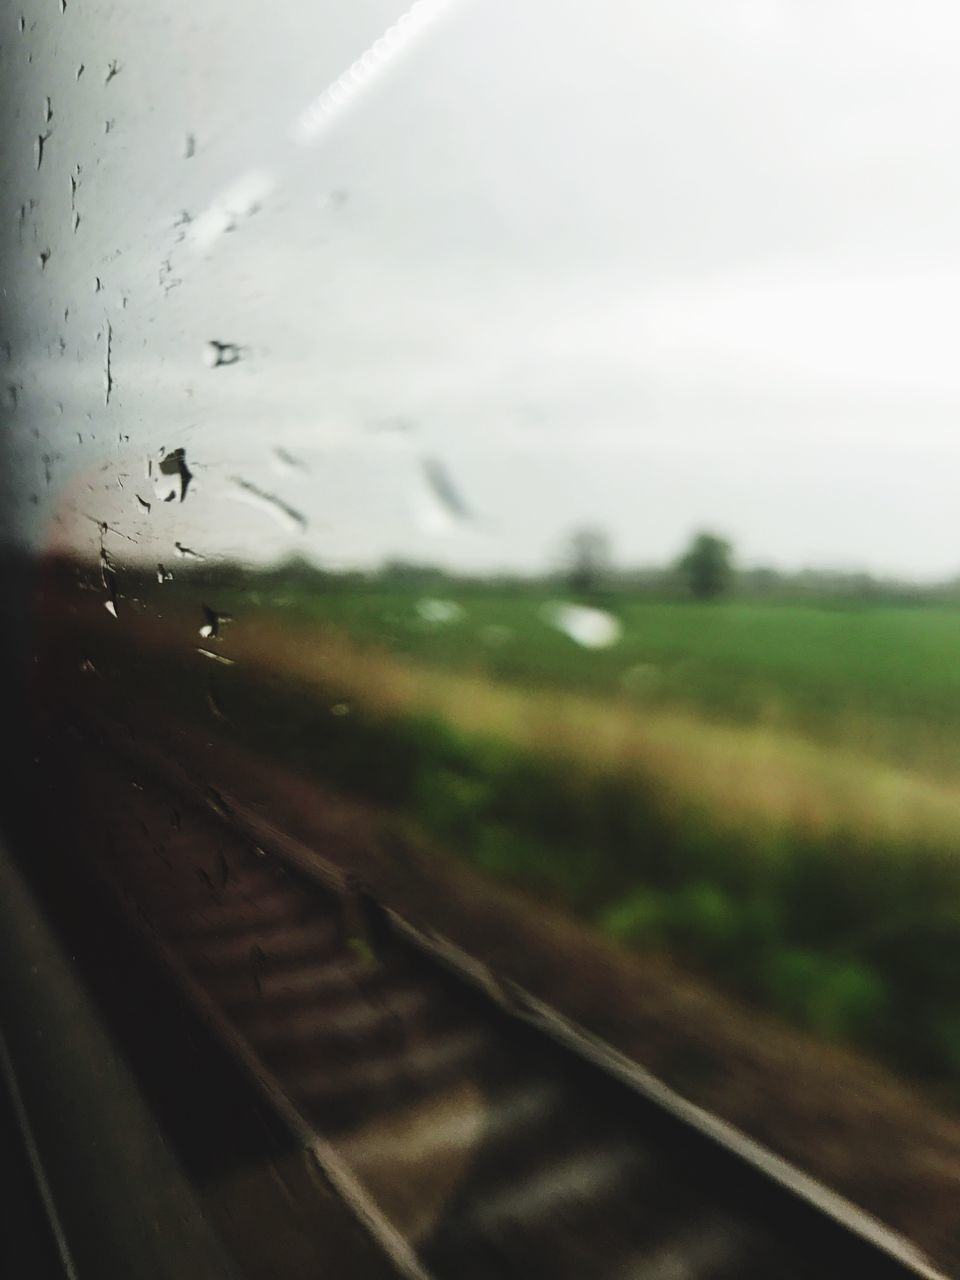 transportation, drop, no people, nature, landscape, wet, agriculture, journey, day, sky, raindrop, close-up, plant, outdoors, freshness